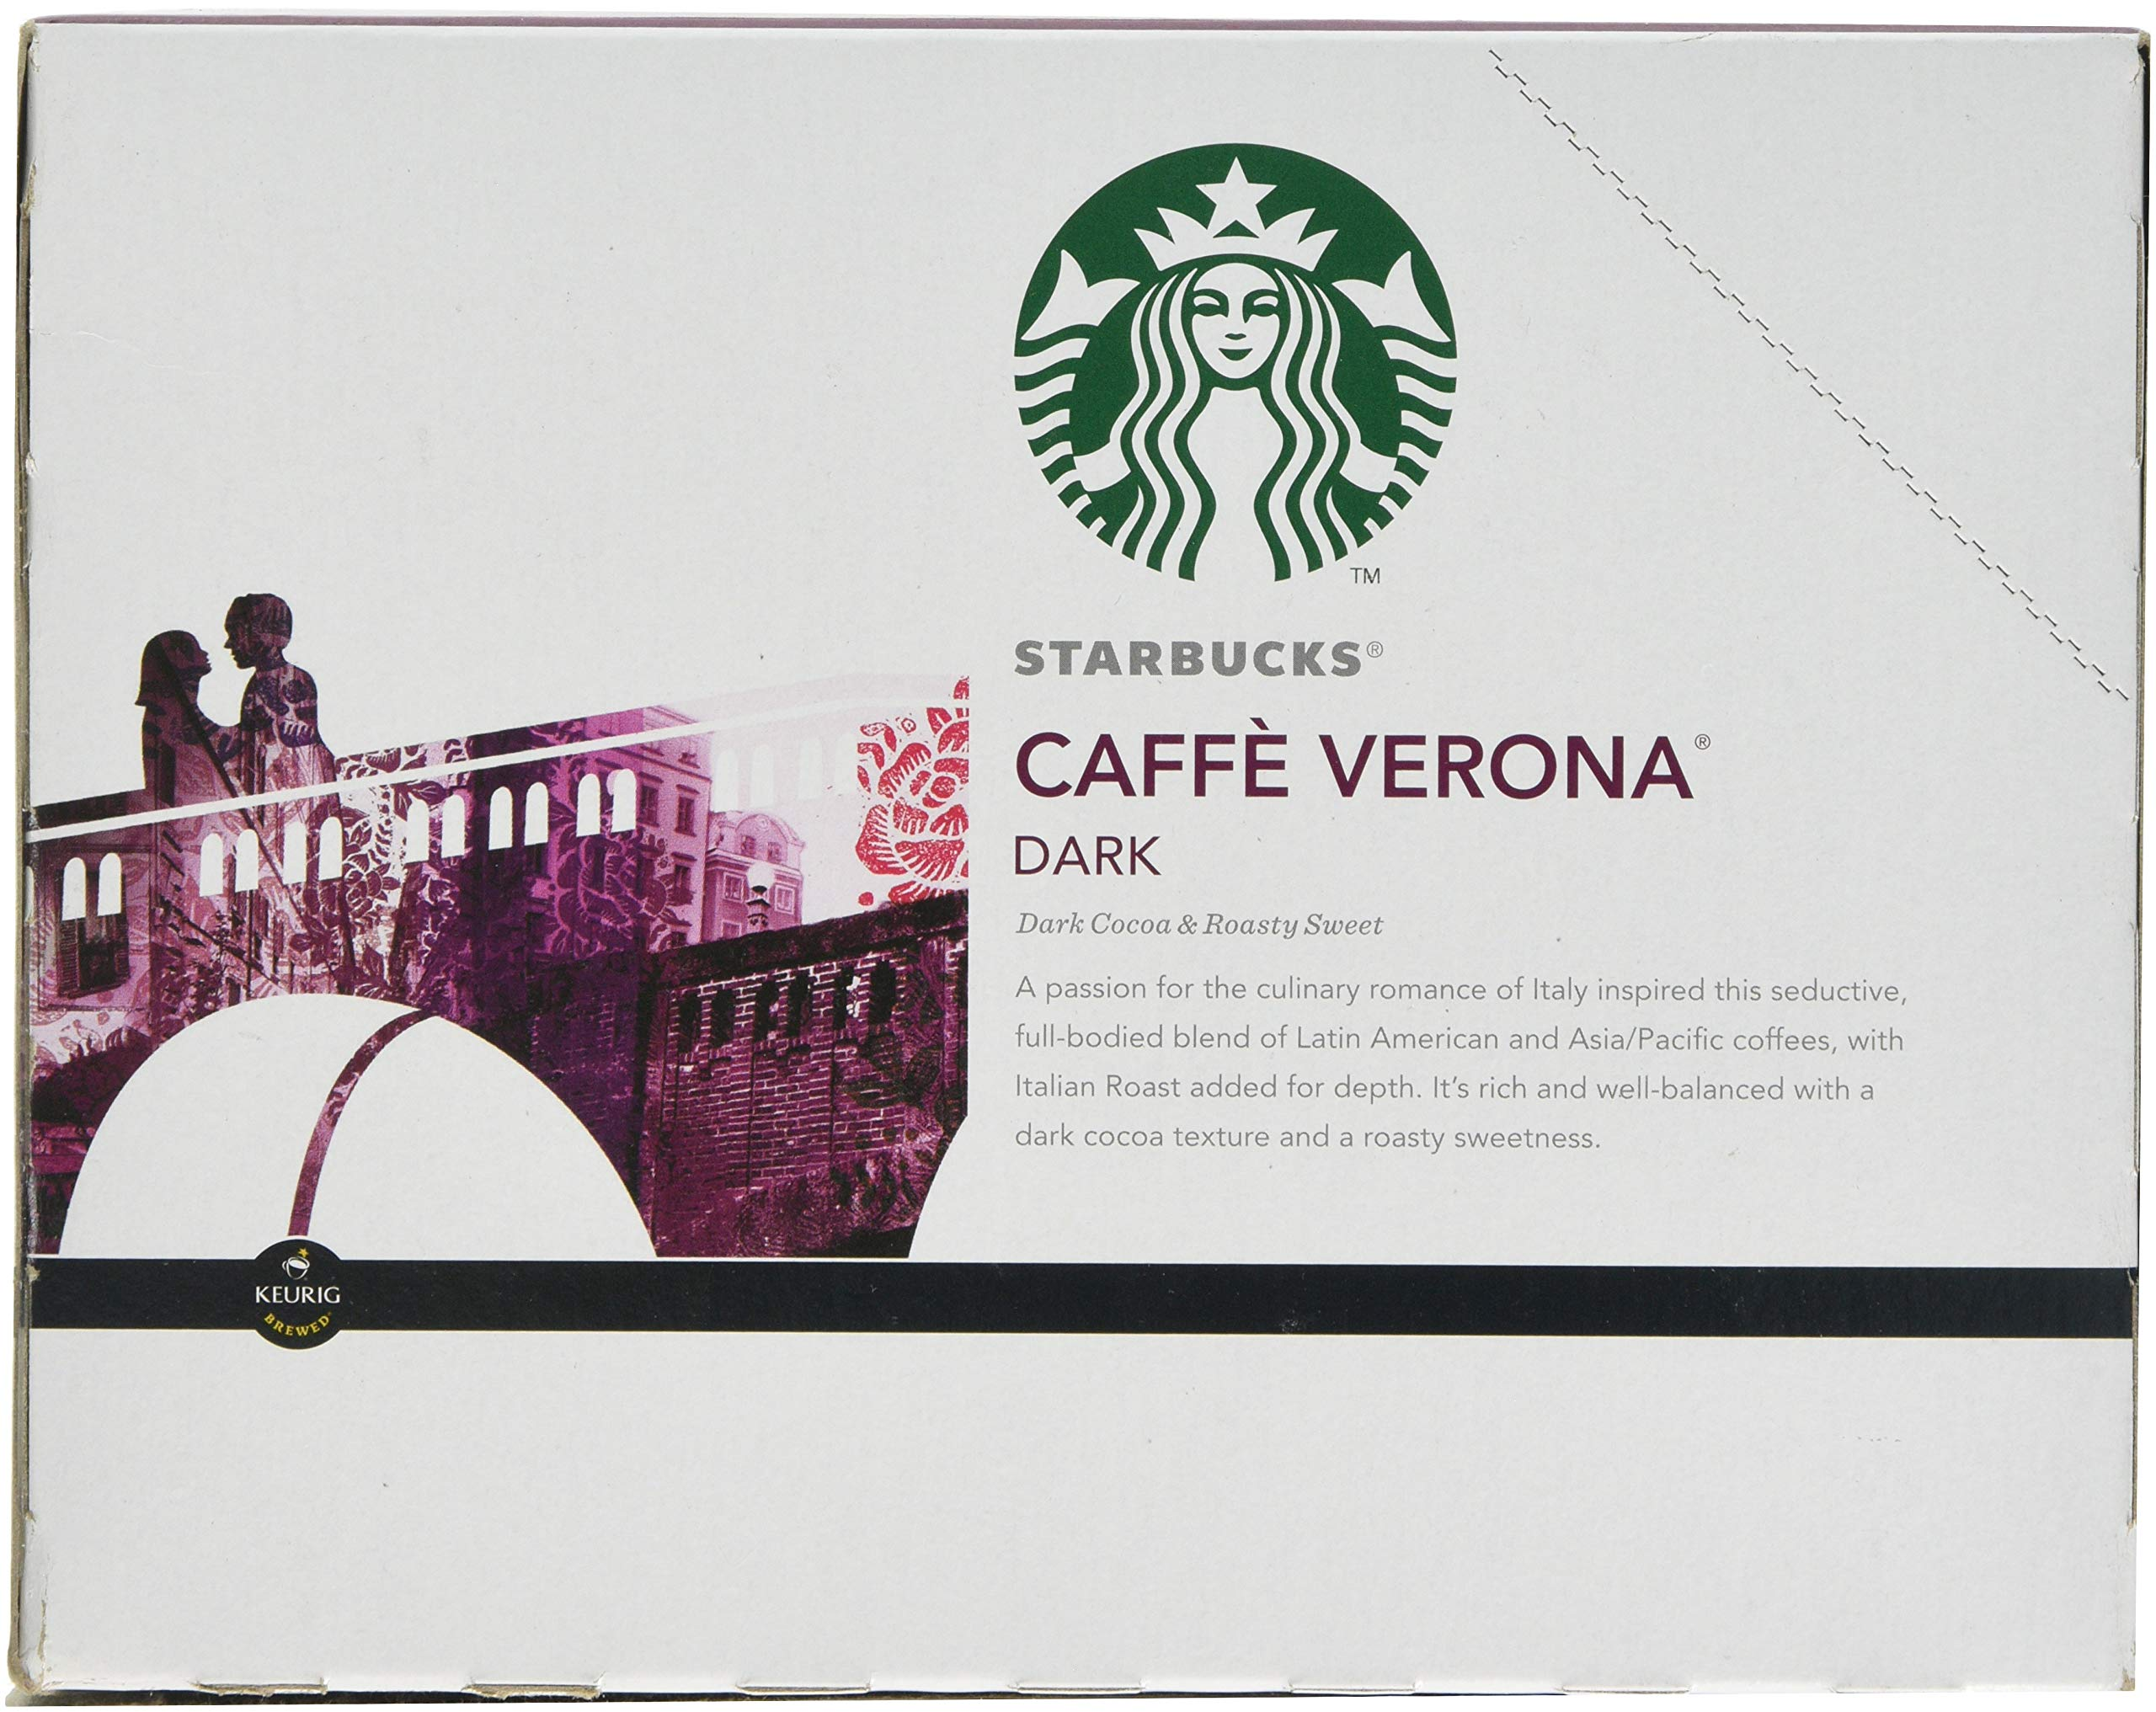 Starbucks Caffe Verona Dark, K-Cup for Keurig Brewers, 24 Count by Starbucks